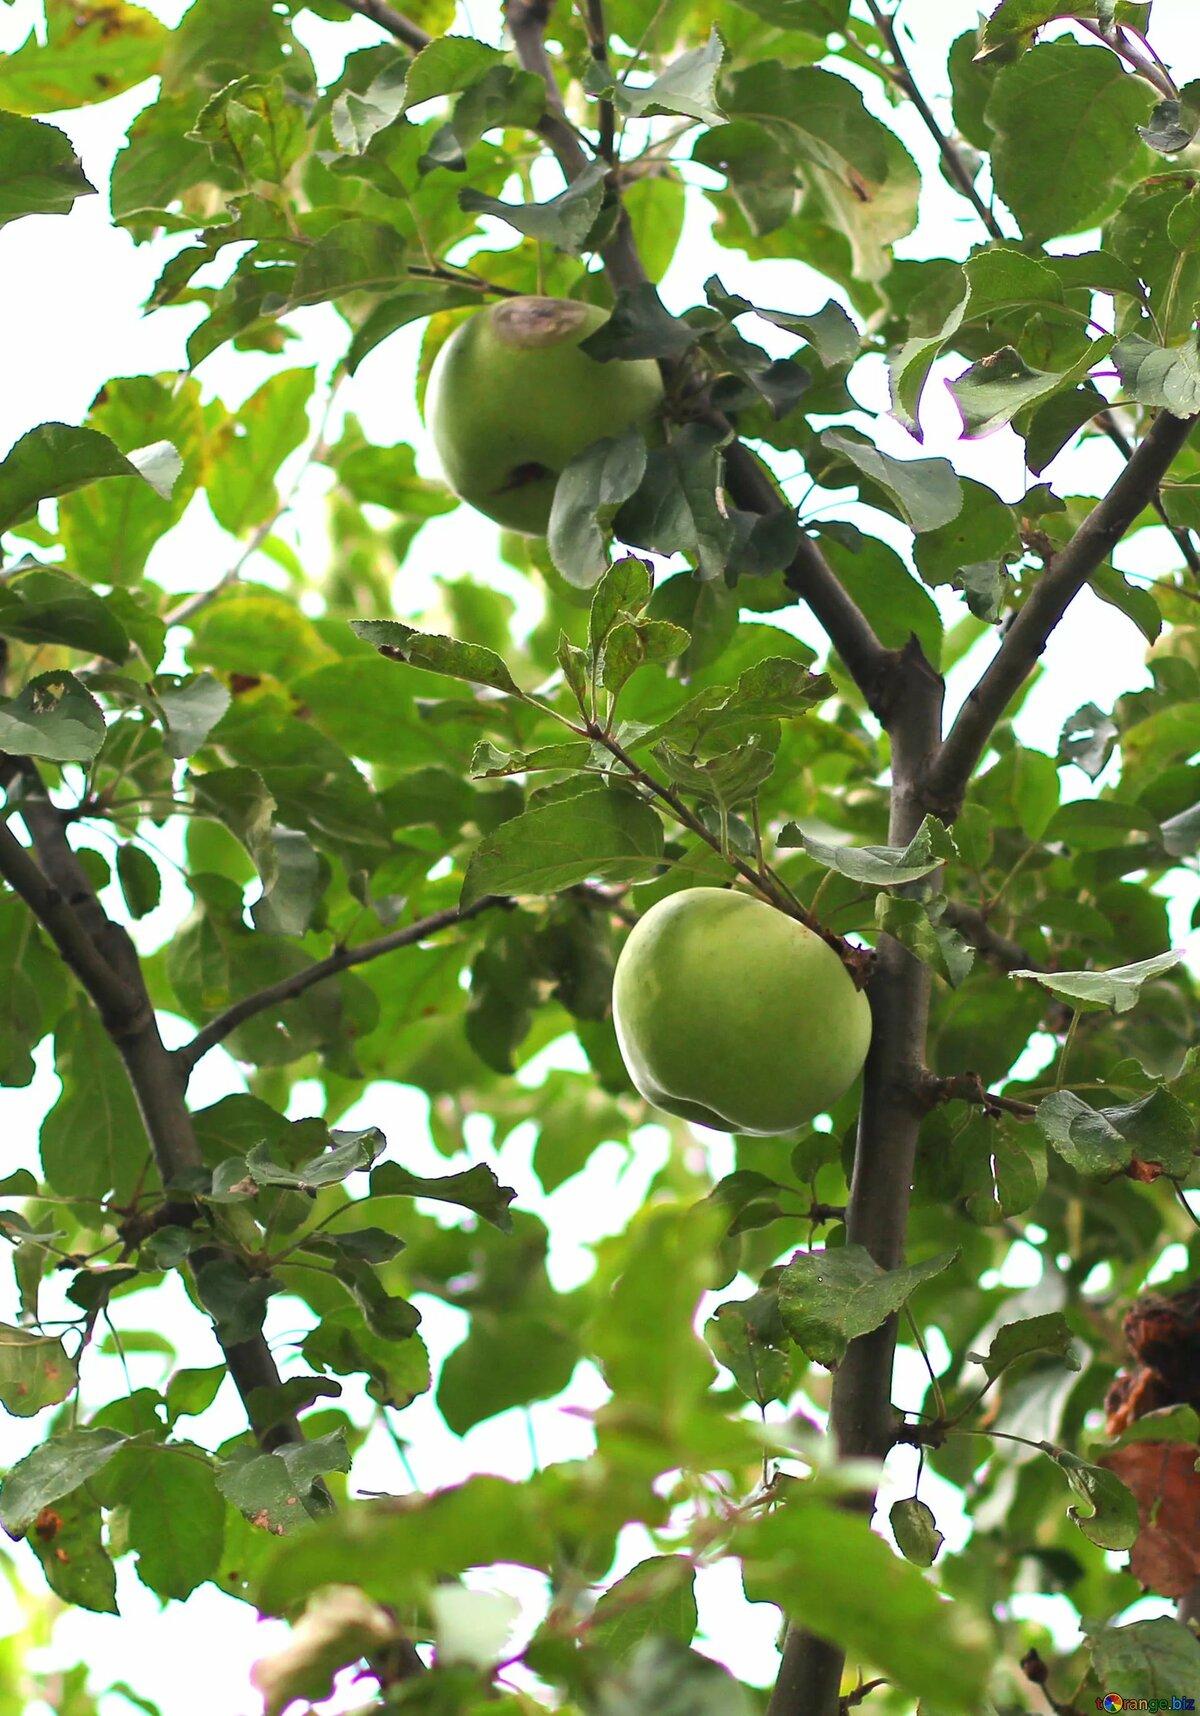 Картинки как растут яблоки